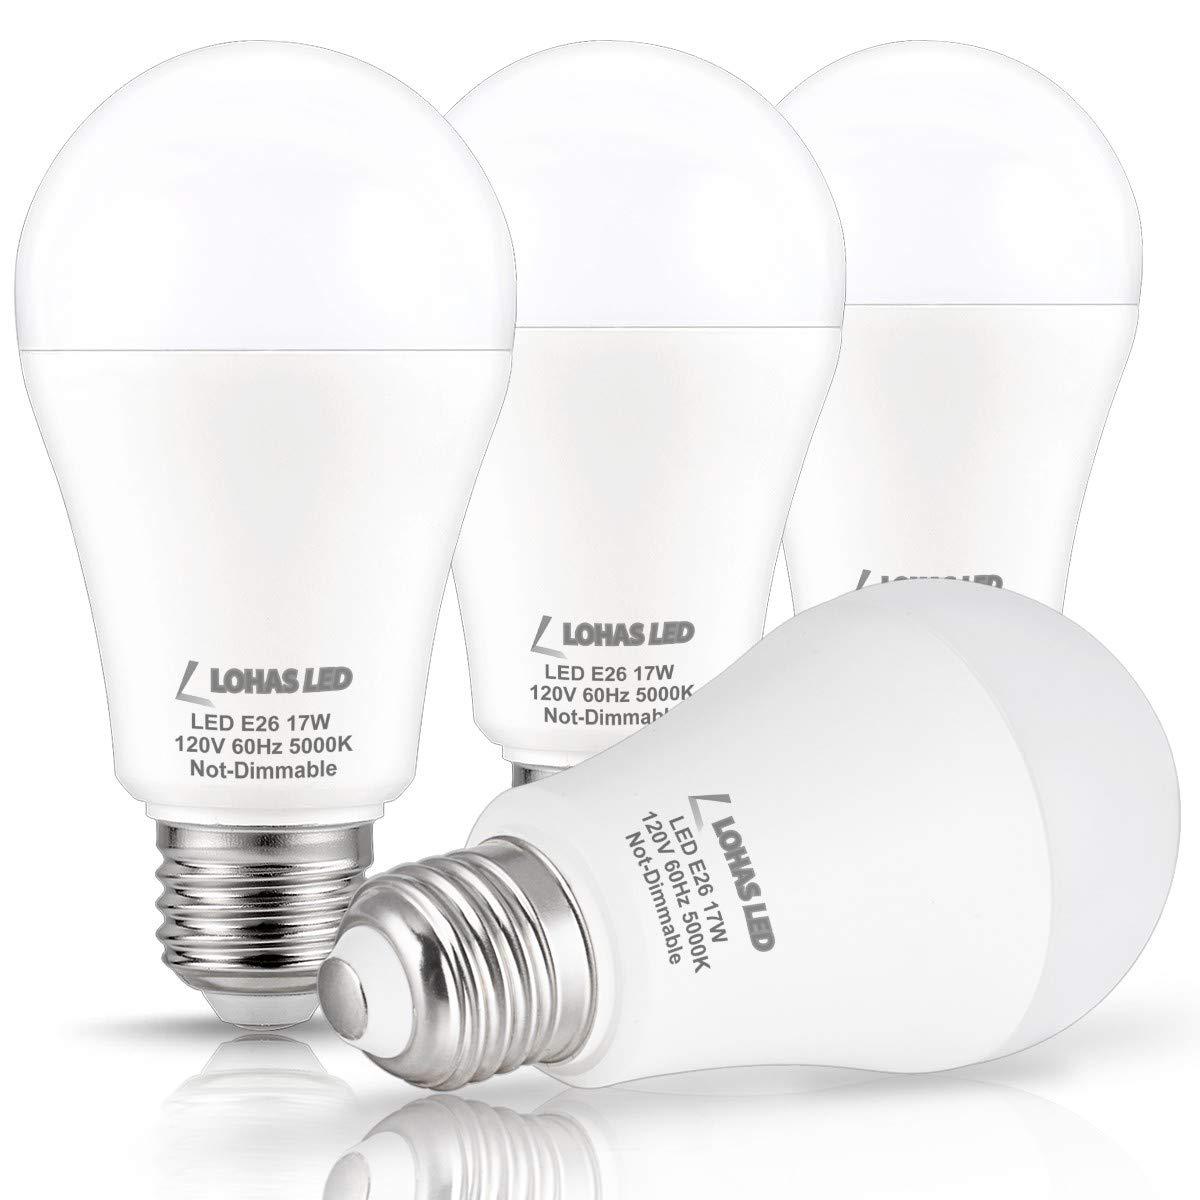 LOHAS LED Bulb 100-150W Equivalent(UL Listed), LED Light Bulbs Daylight 5000k, White A19 Bulb 17W, E26 Edison Base LED Lights, LED Home Lighting Lamps, ...